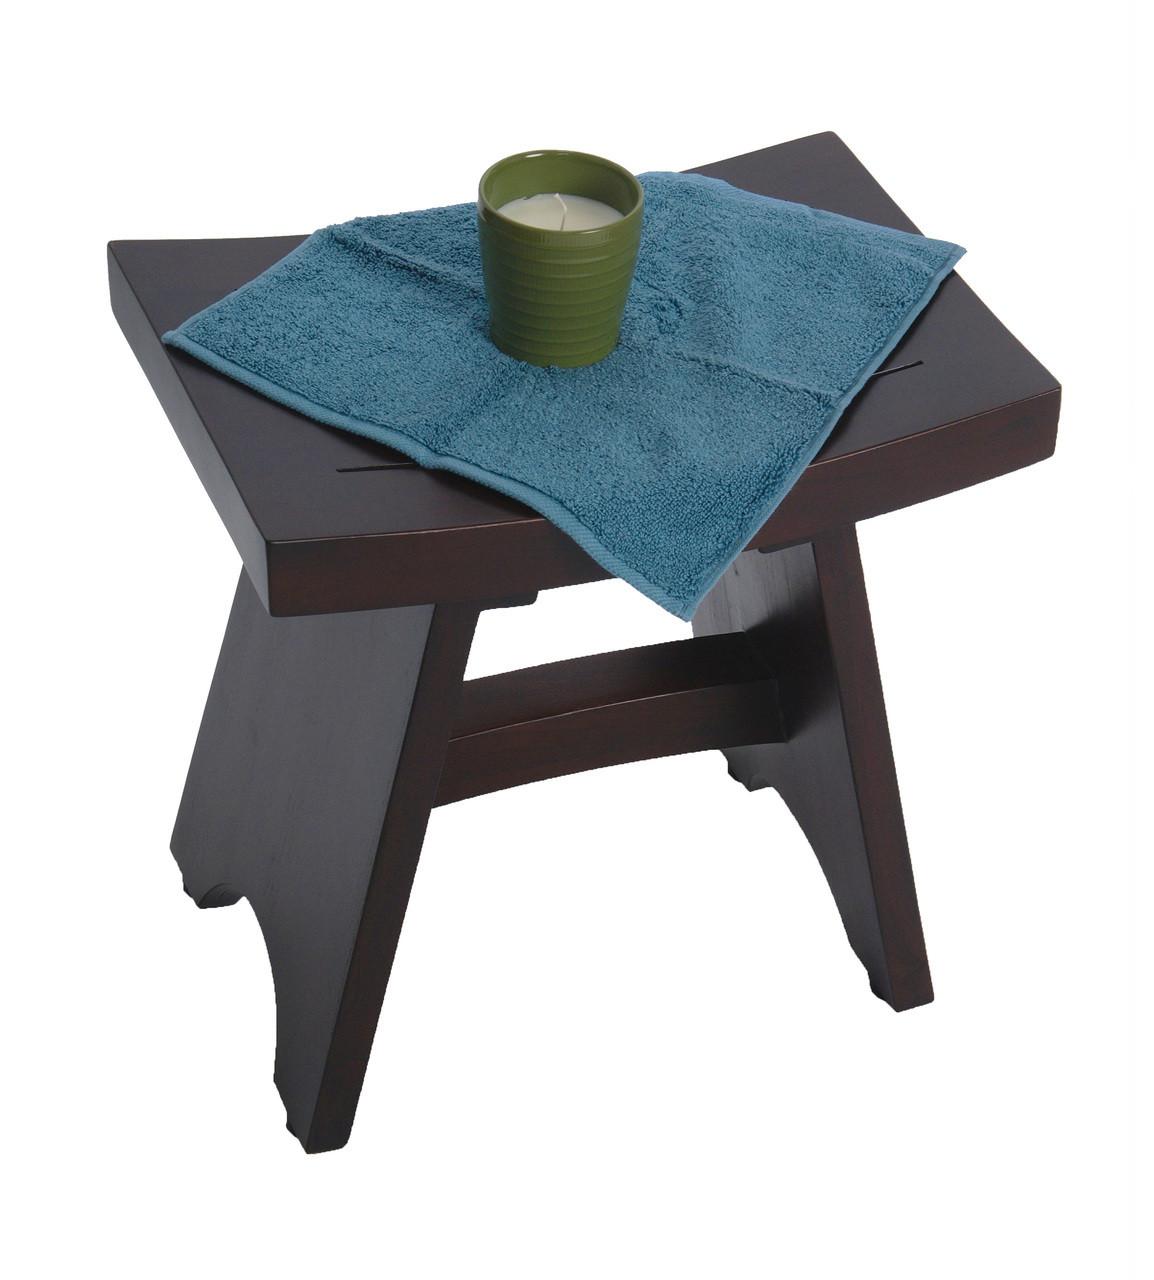 "DecoTeak Serenity 18"" Teak Wood Fully Assembled Shower Bench in Woodland Brown Finish"